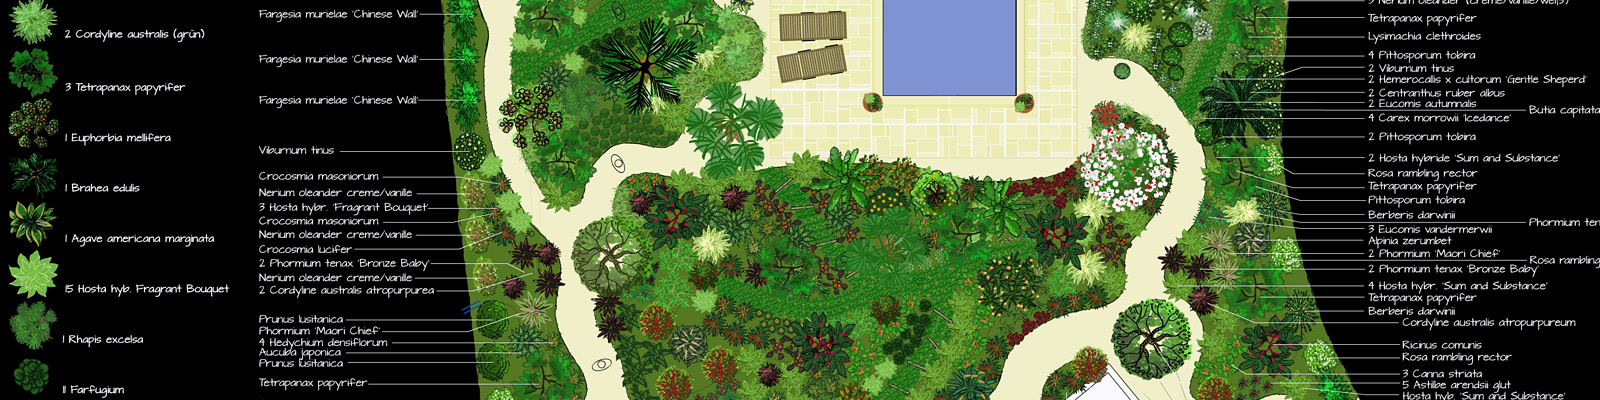 Green Parrot Gardens | Successful Planning | Exotic Garden Plan near St Tropez